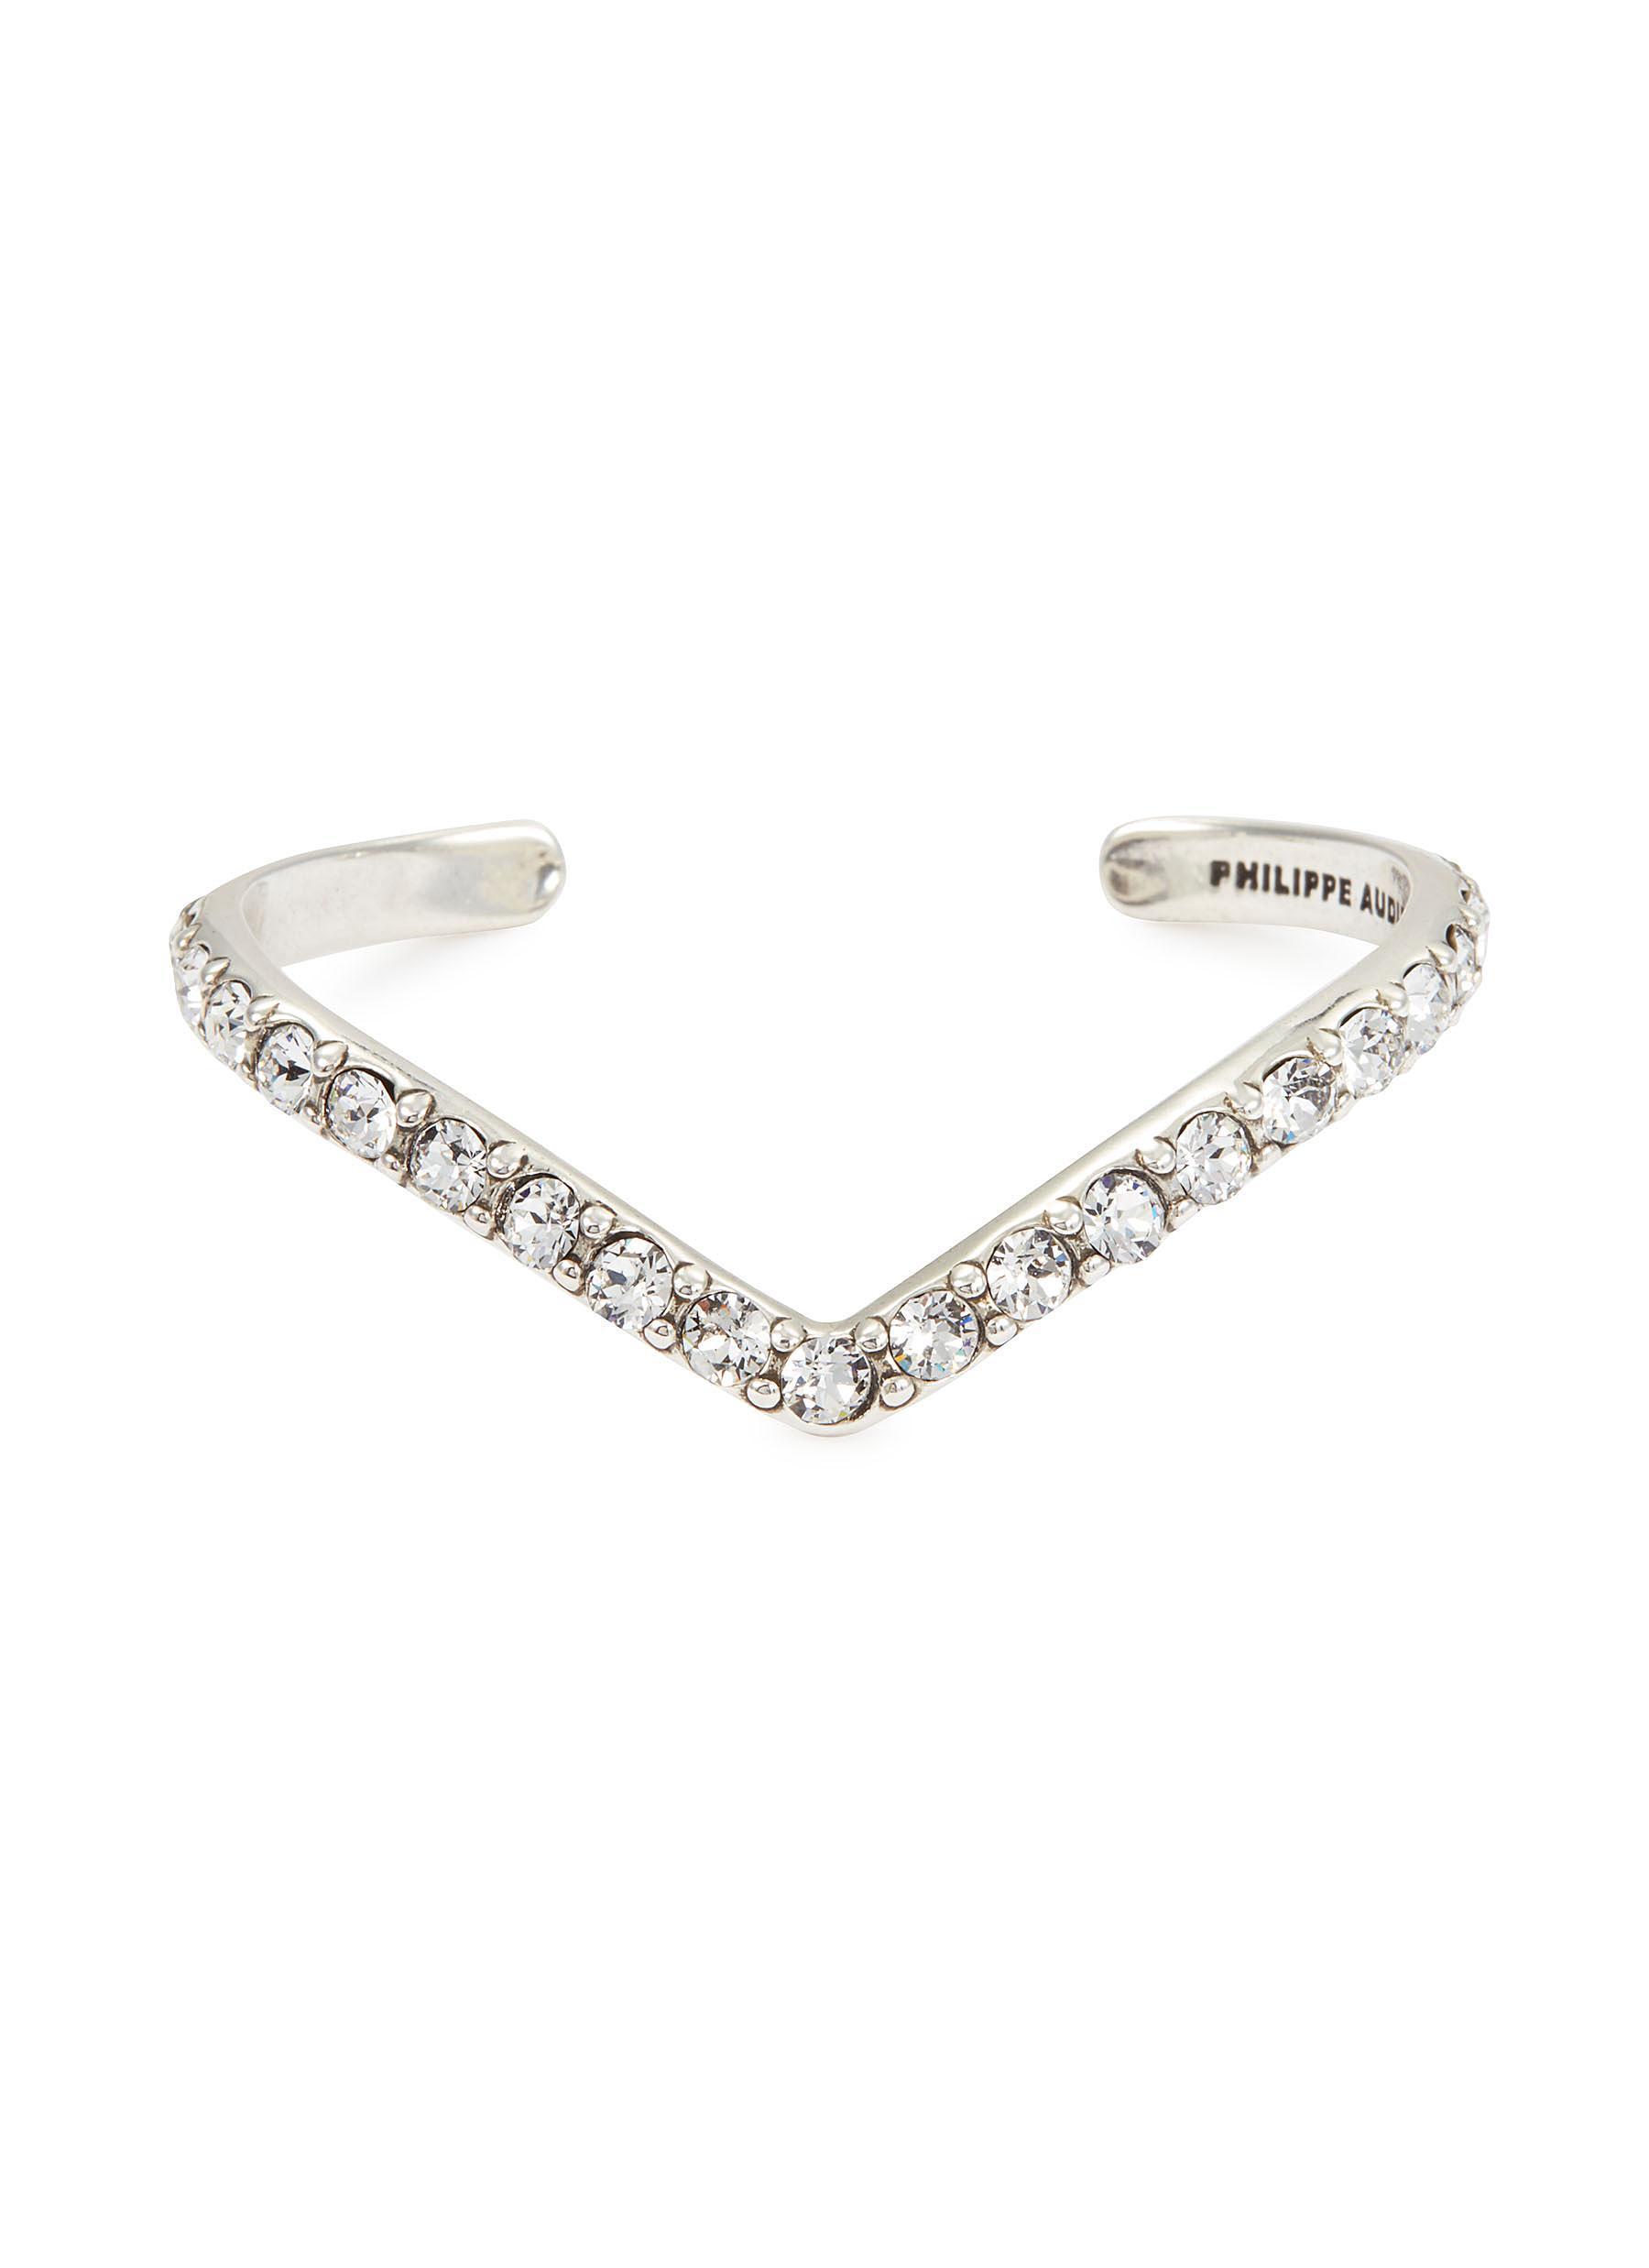 32afbb054 Philippe Audibert 'bonnie' Swarovski Crystal V-shaped Cuff in ...